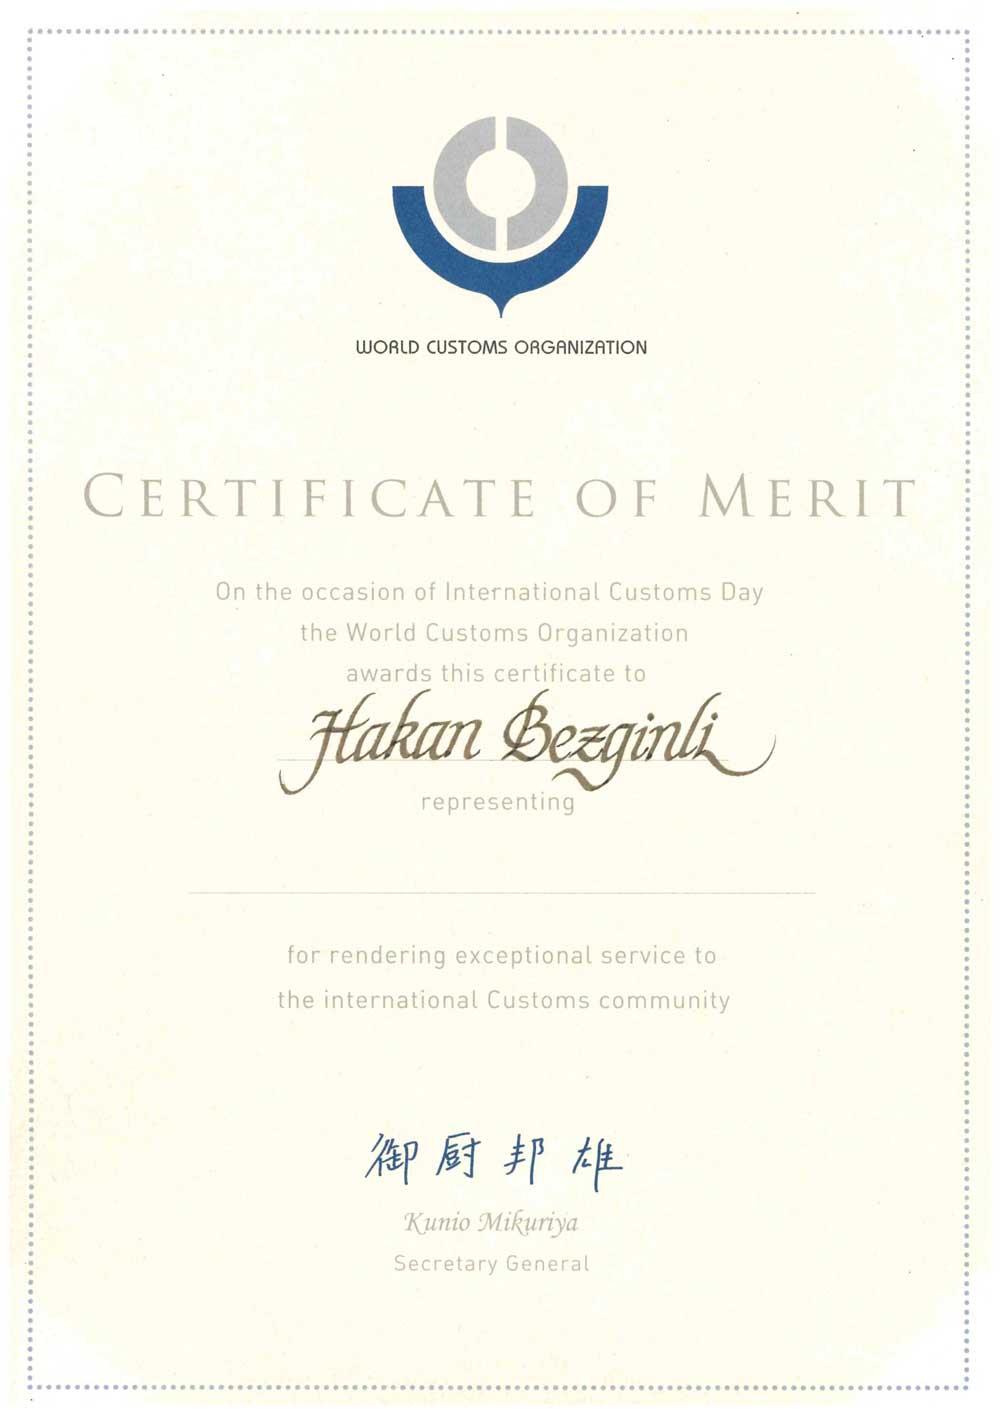 certificate-of-merit